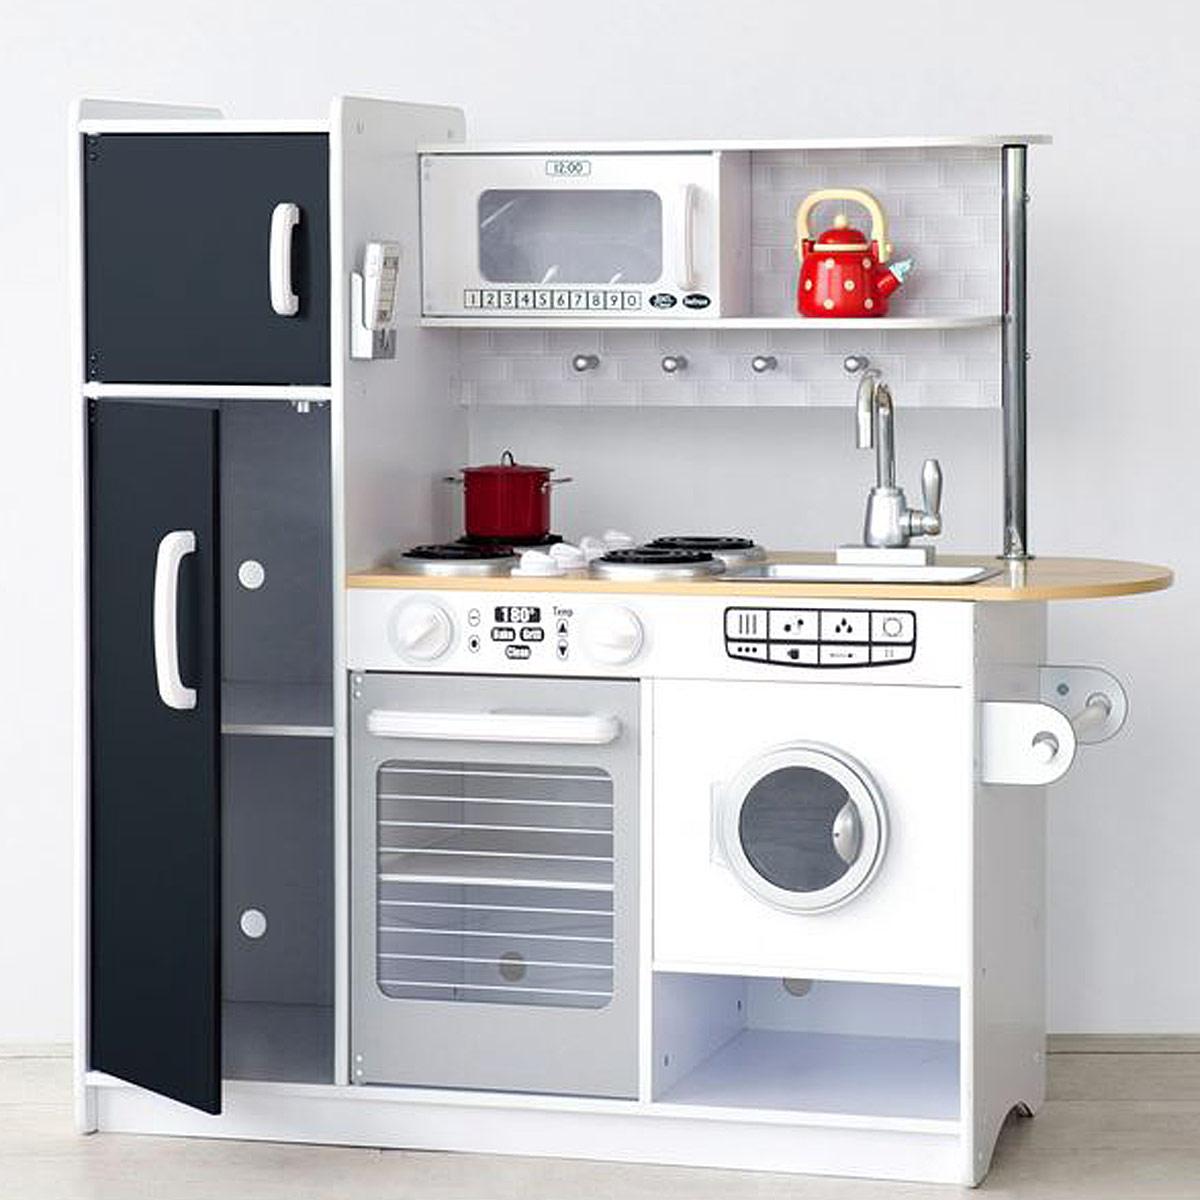 KidKraft Pepperpot Legekøkken m vaskemaskine Kr 1 799   -> Kuchnia Drewniana Brio